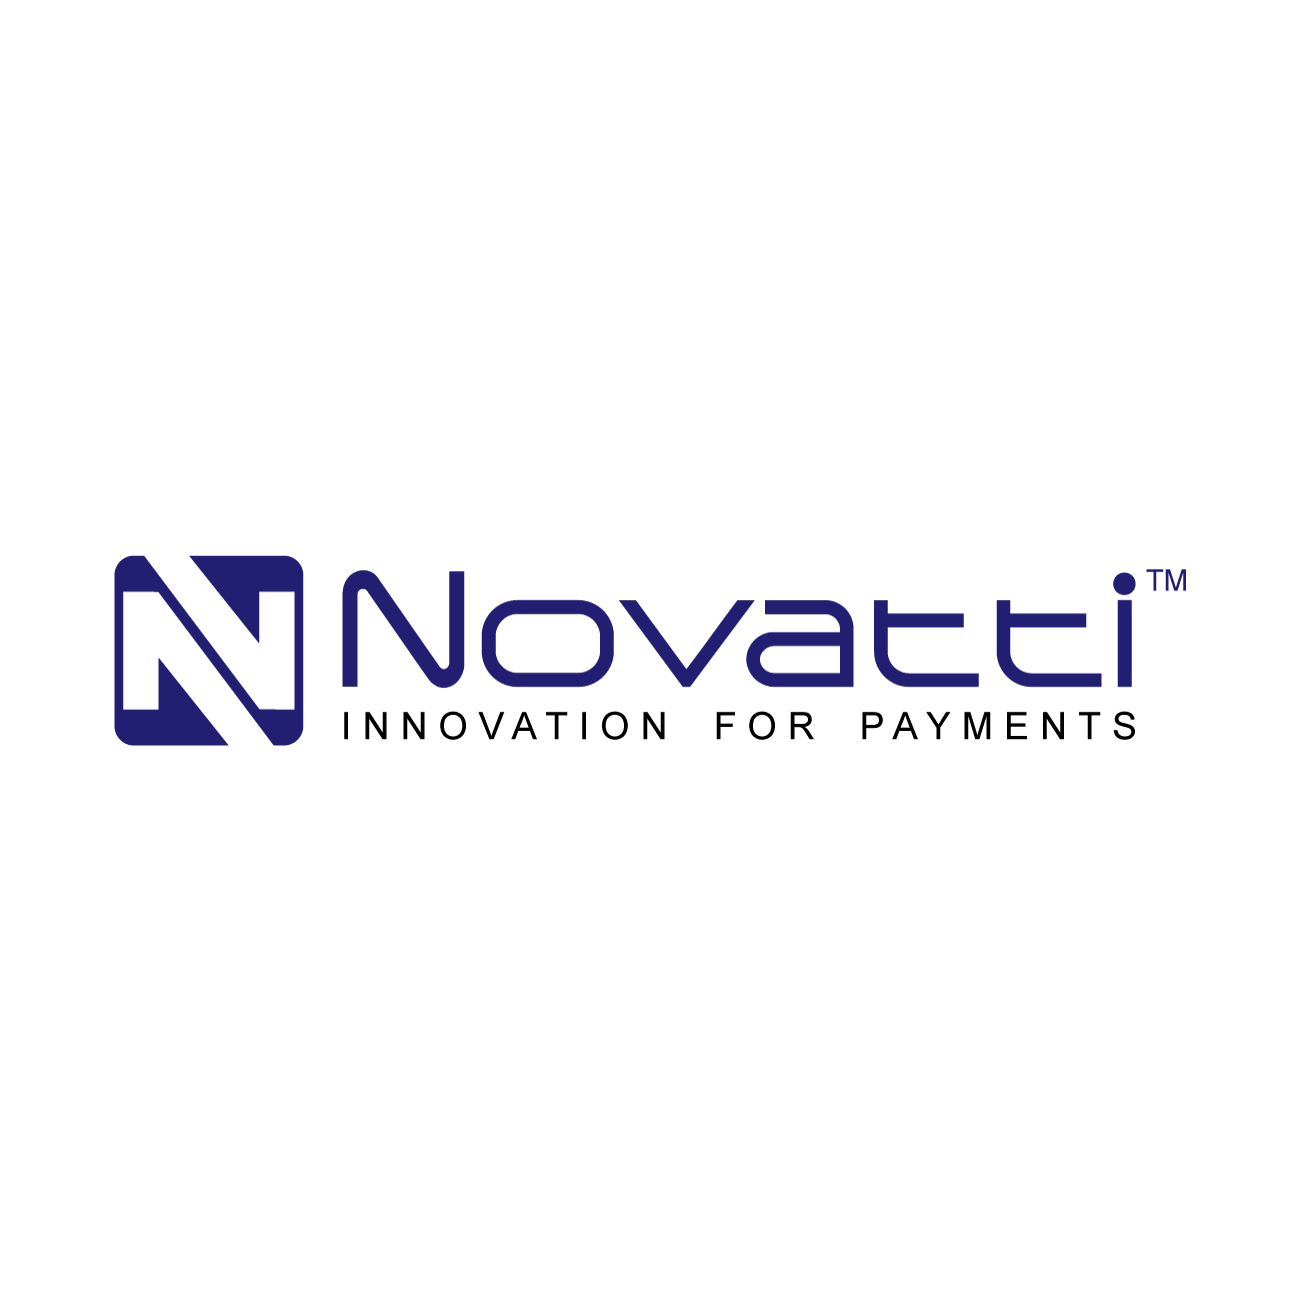 ASX:NOV logo